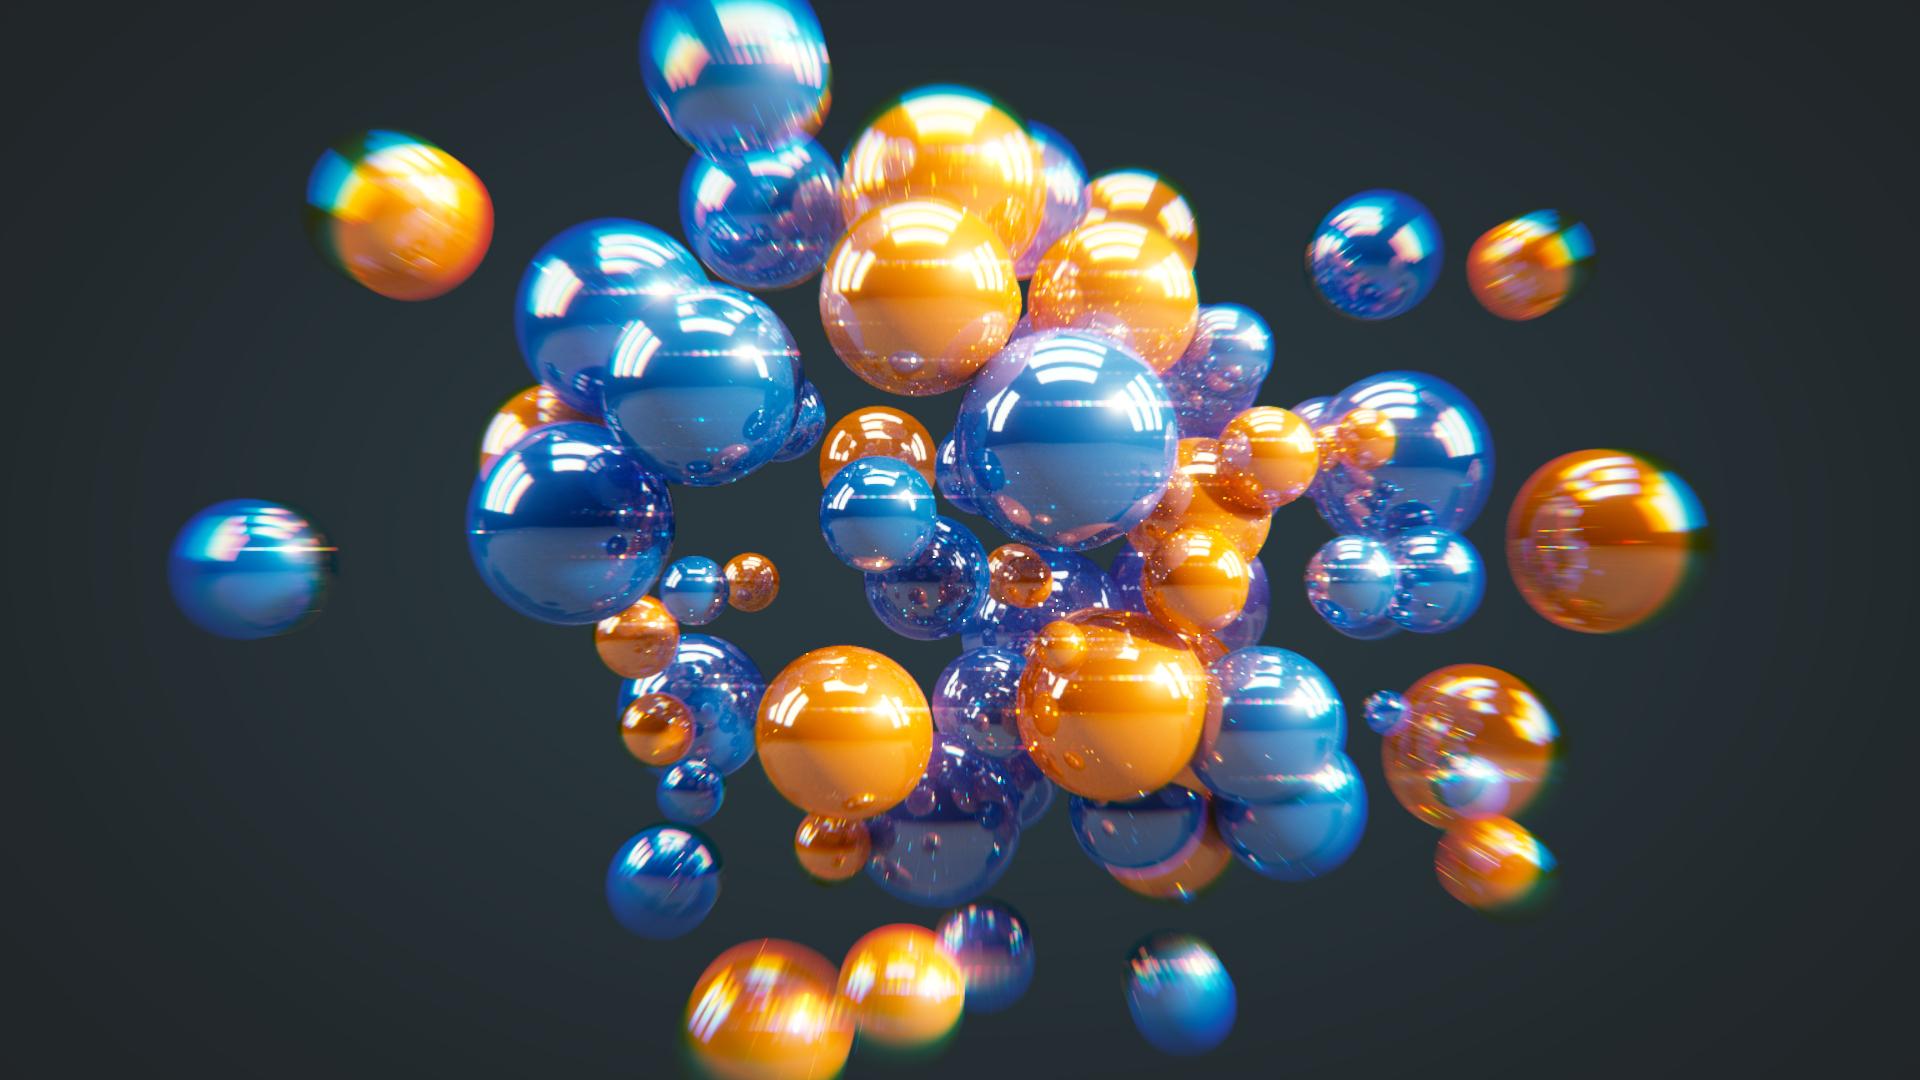 bolas, brillos, 3D, infográfico, azul, naranja - Fondos de Pantalla HD - professor-falken.com